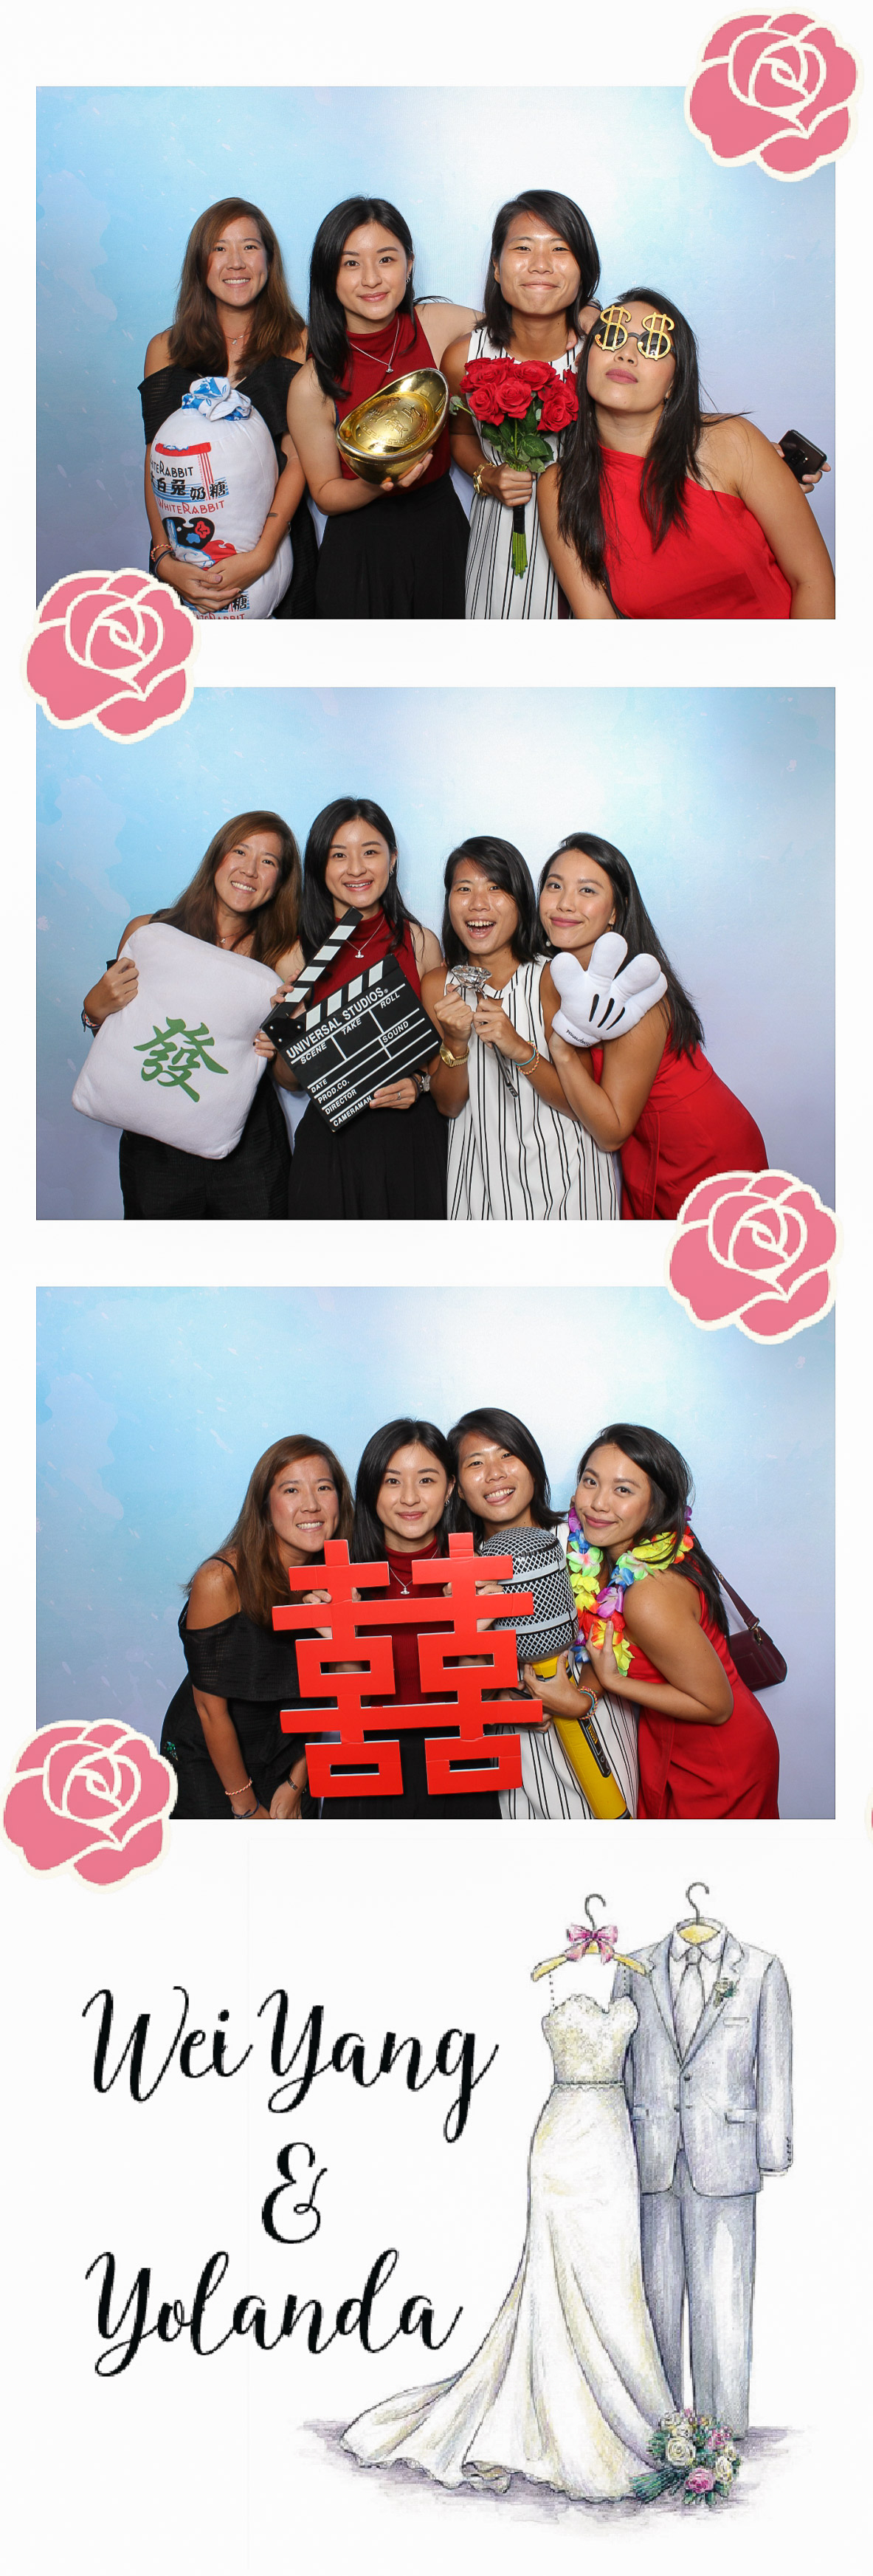 Photobooth 1706-31